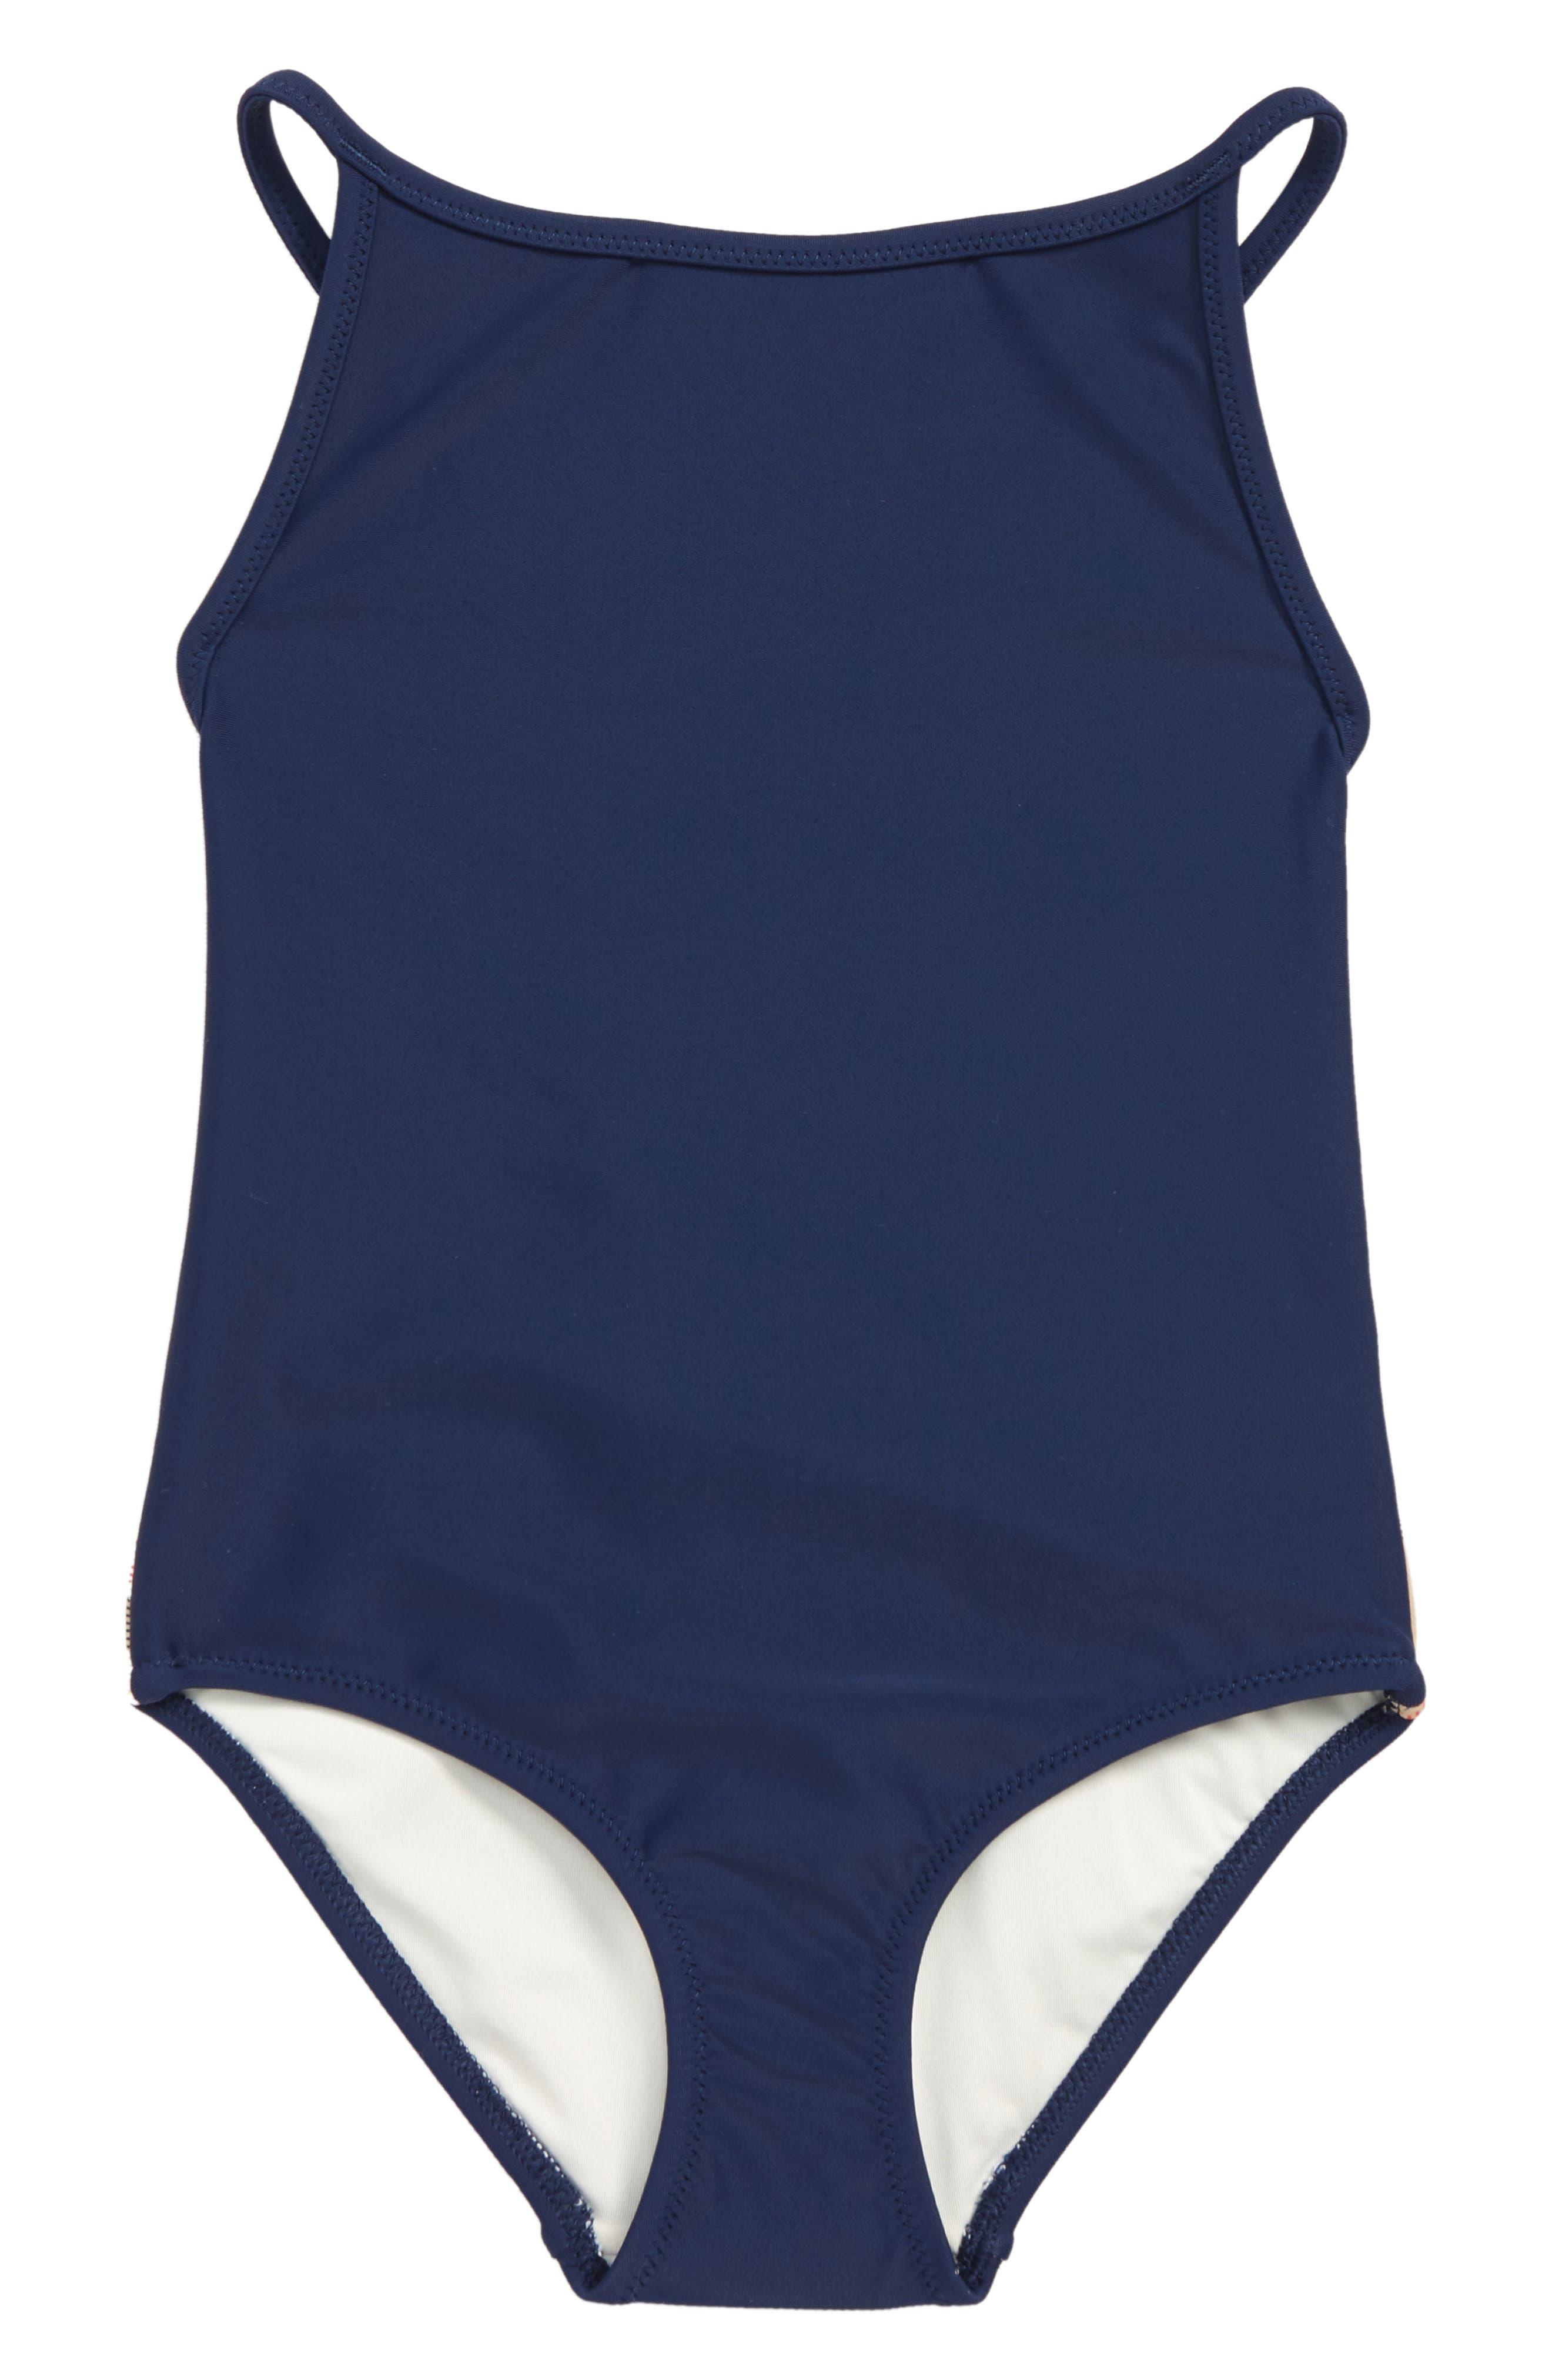 Sandine One-Piece Swimsuit,                         Main,                         color, NAVY